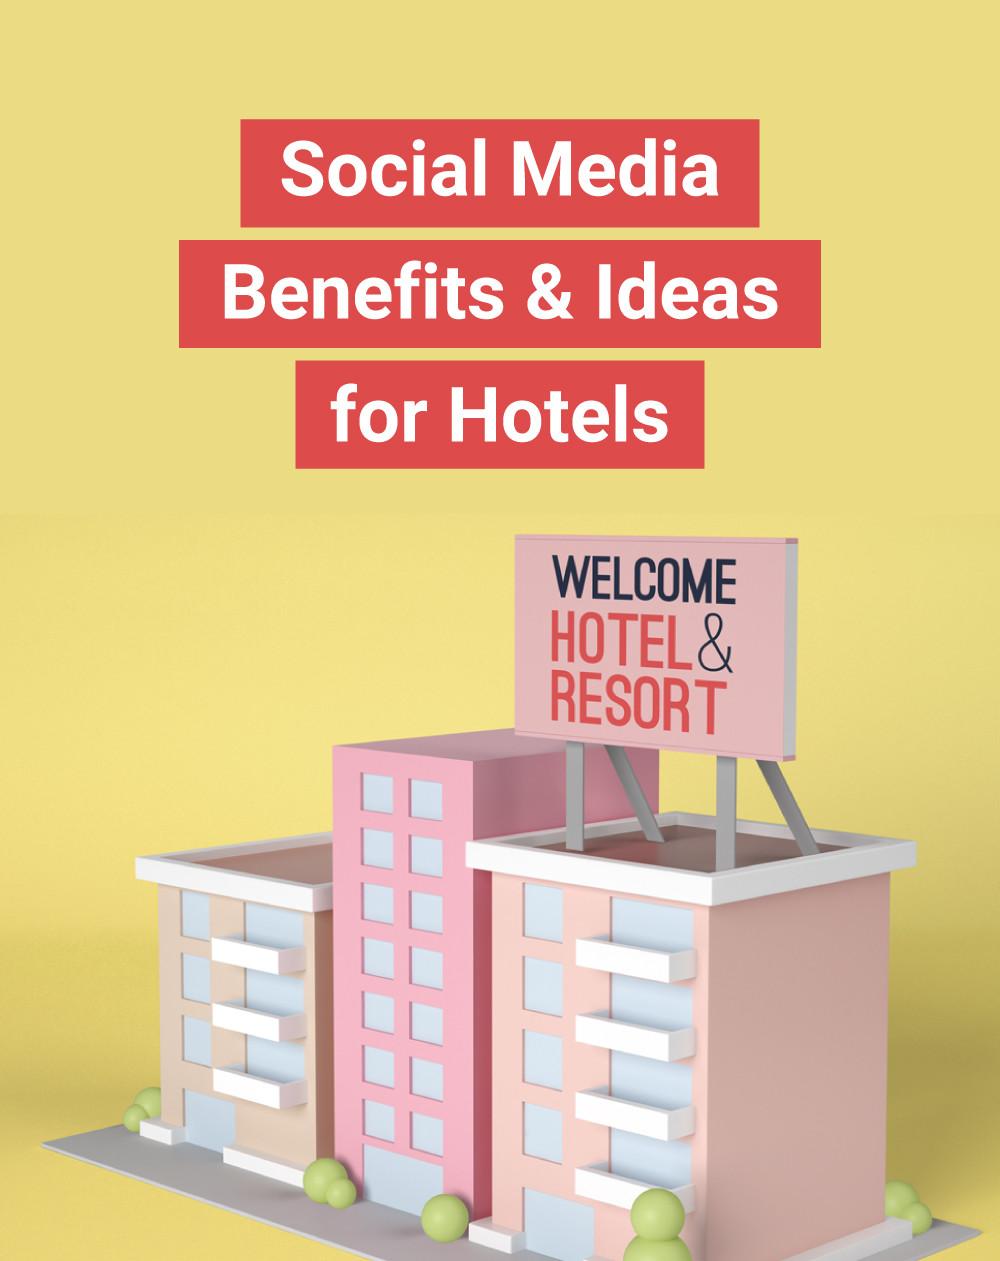 Social Media Benefits & Ideas for Hotels